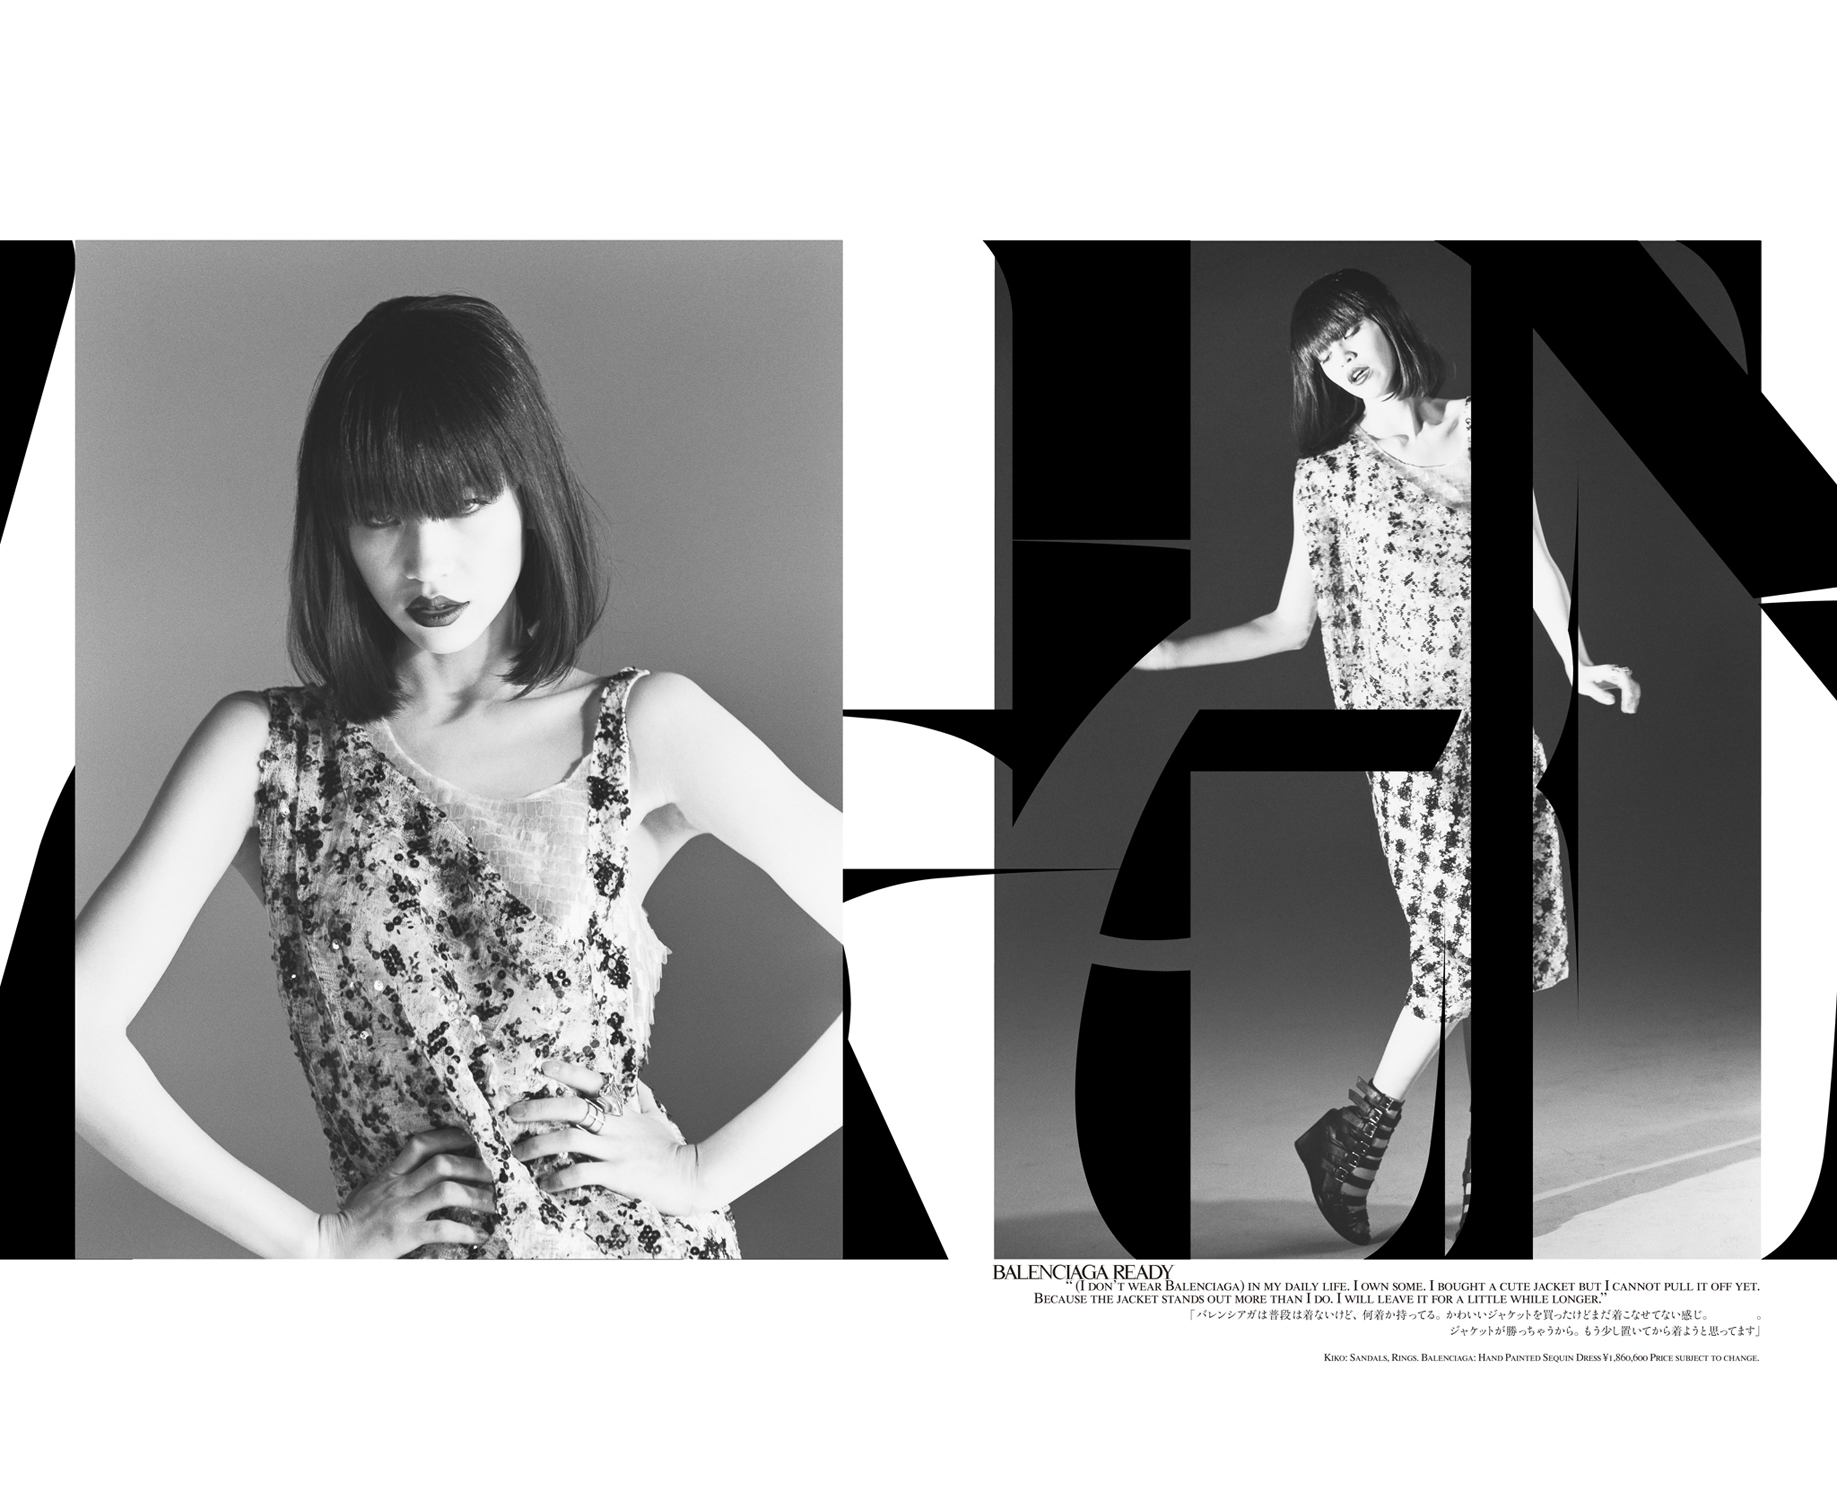 the reality show magazine | Kiko mizuhara | photography by nobuyoshi araki